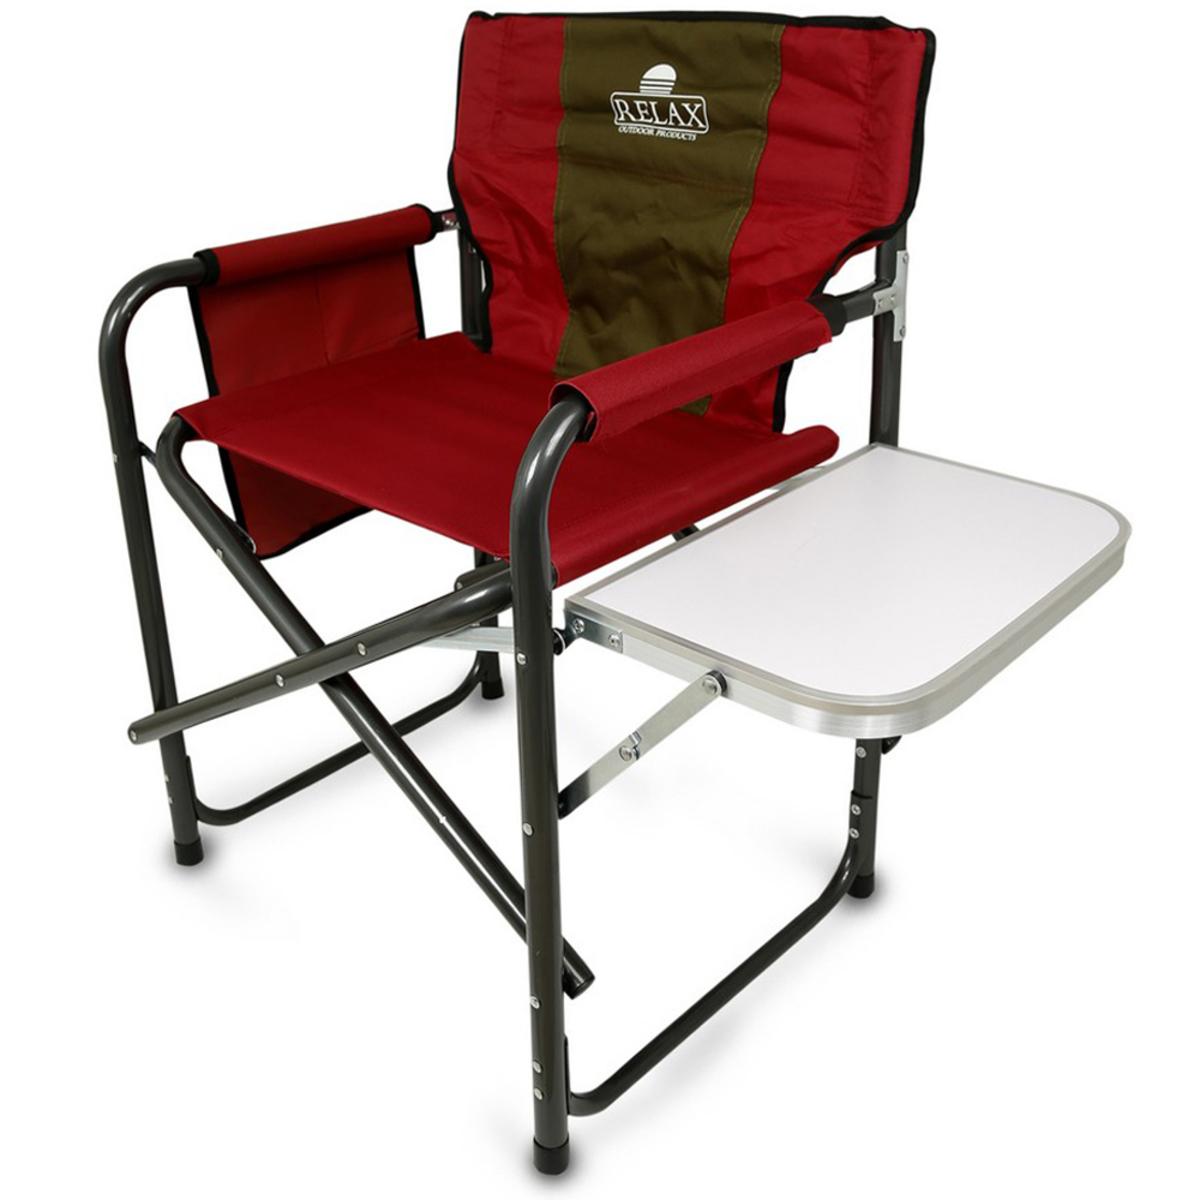 Buy Relax Camping Chair Hx022 Online Lulu Hypermarket Qatar